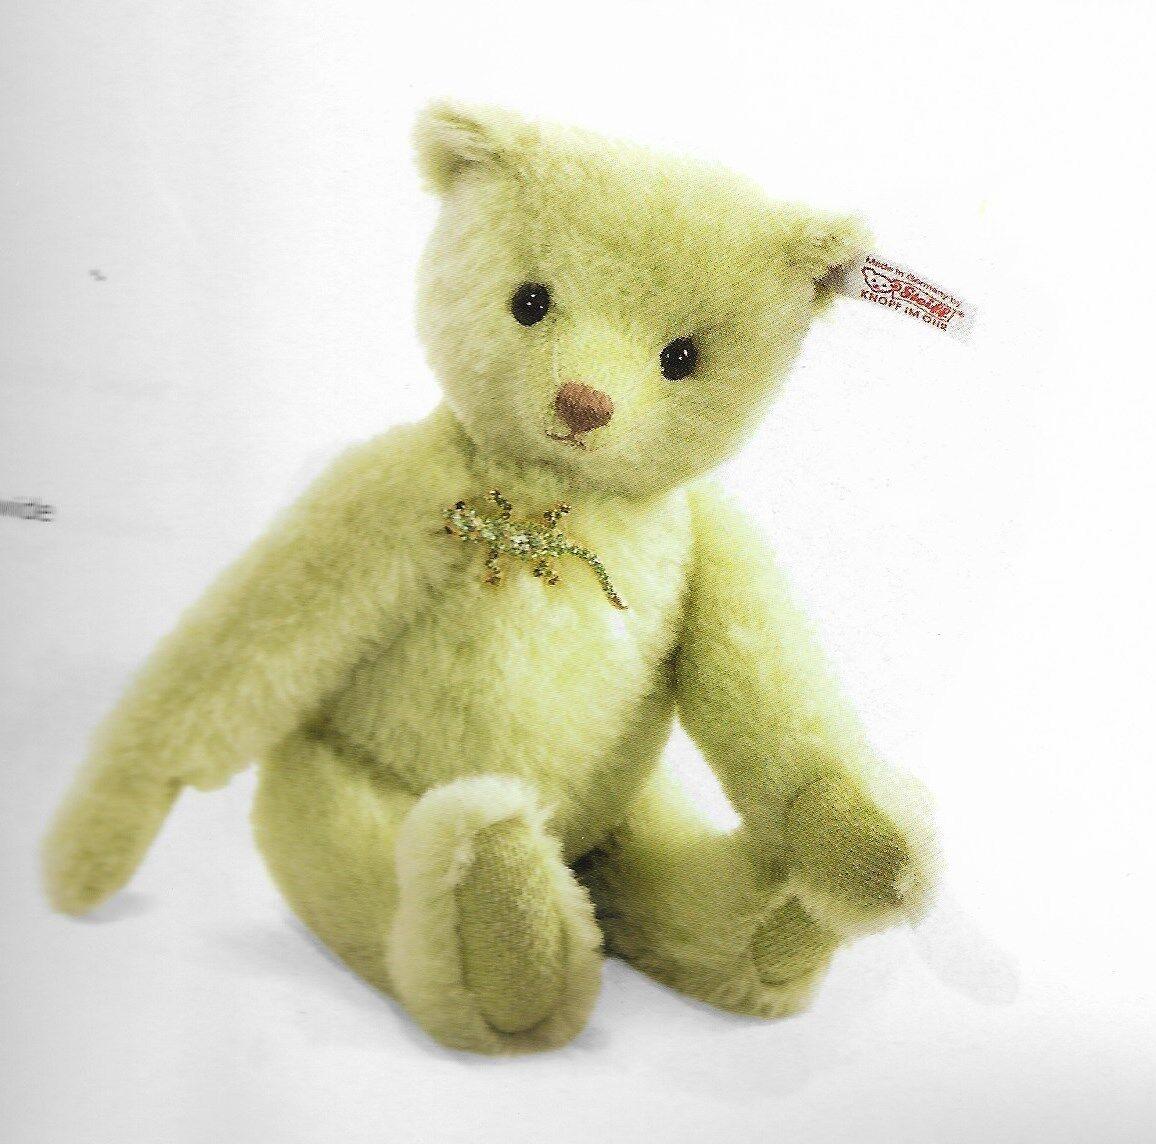 STEIFF  LYSANDER TEDDY BEAR  EAN 034923  DELICATE verde ALPACA -LIM EDITION-10